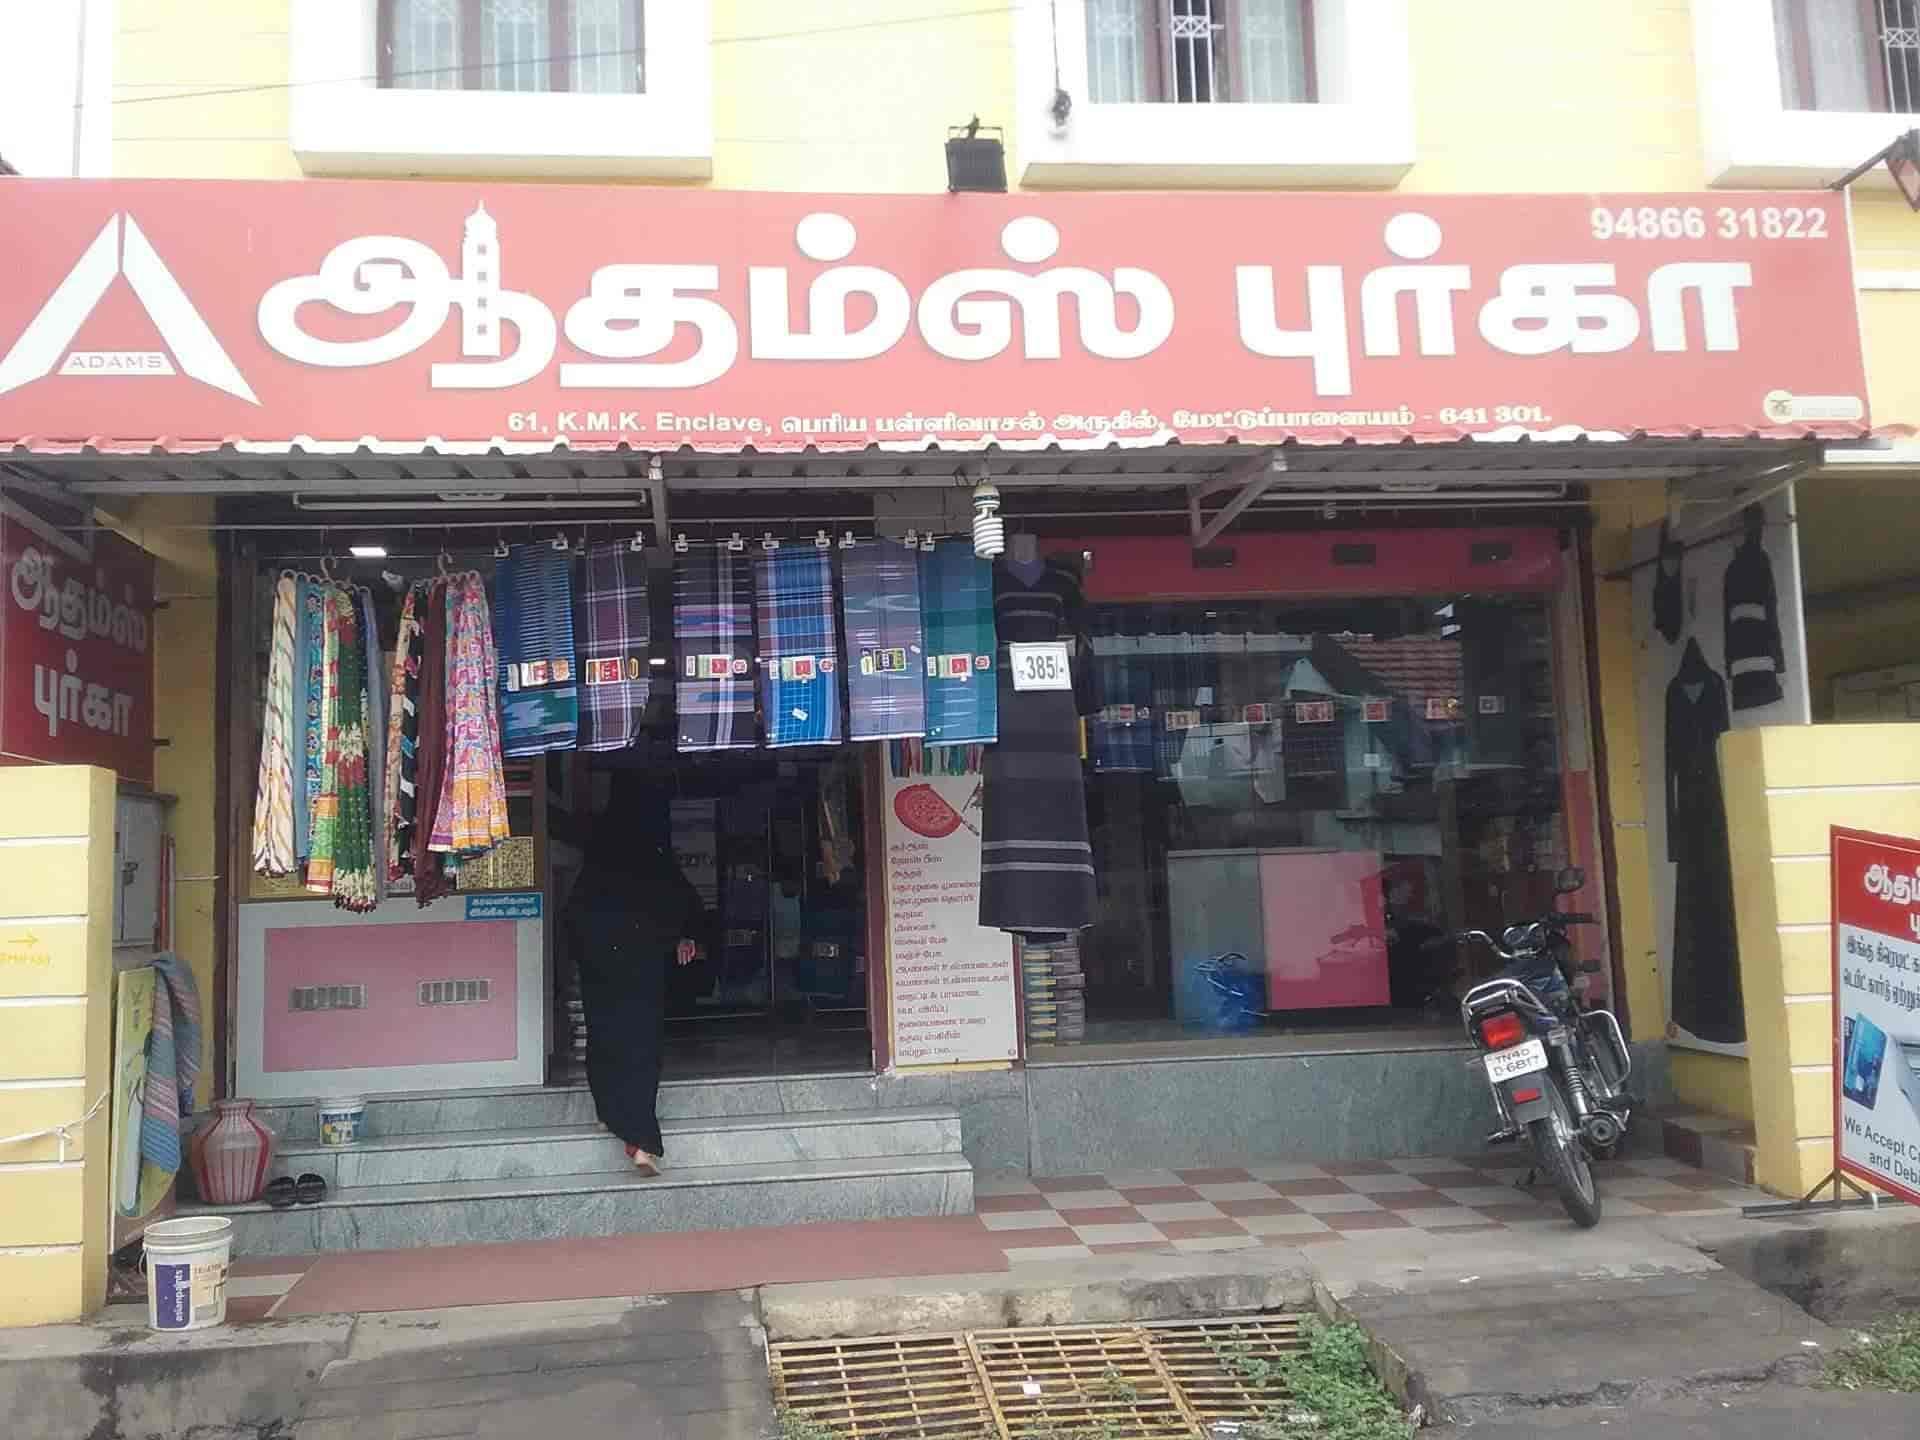 Top 10 Religious Product Dealers in Coimbatore - Best Religious Item